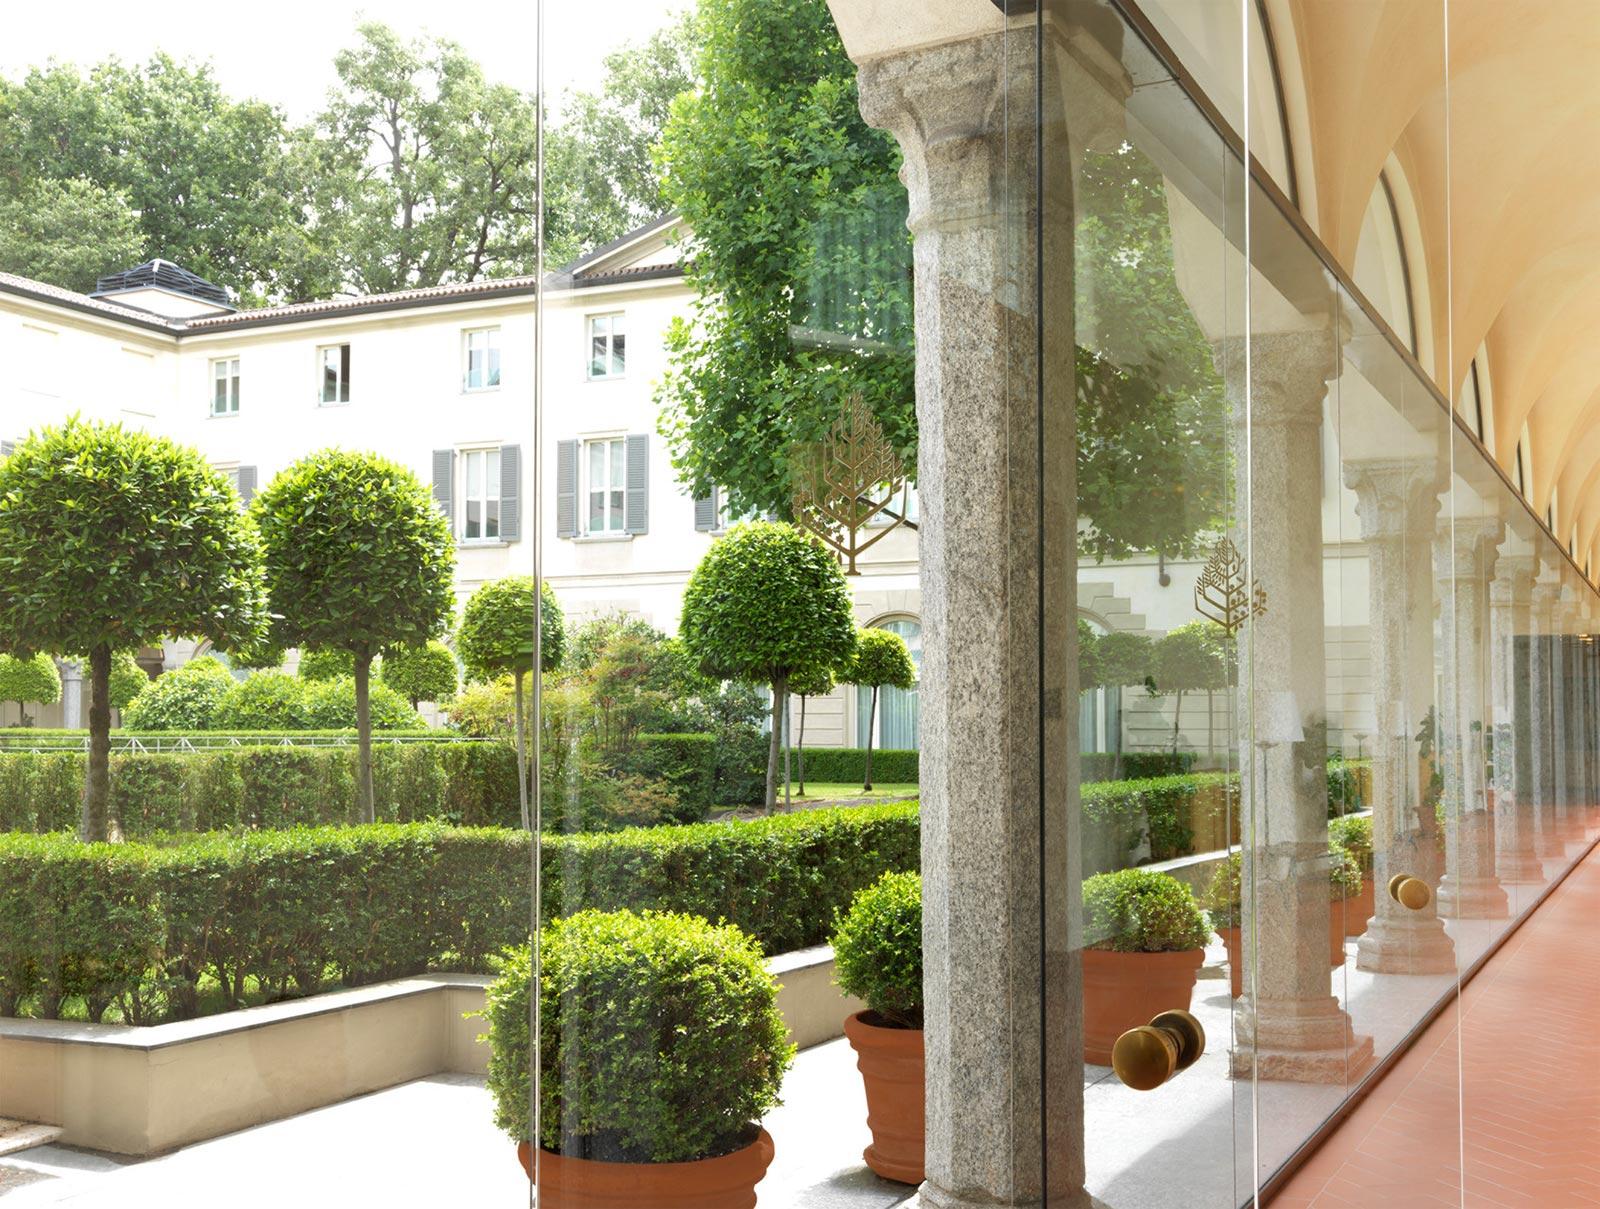 Chef Four Seasons Hotel Milano: Chiostro Four